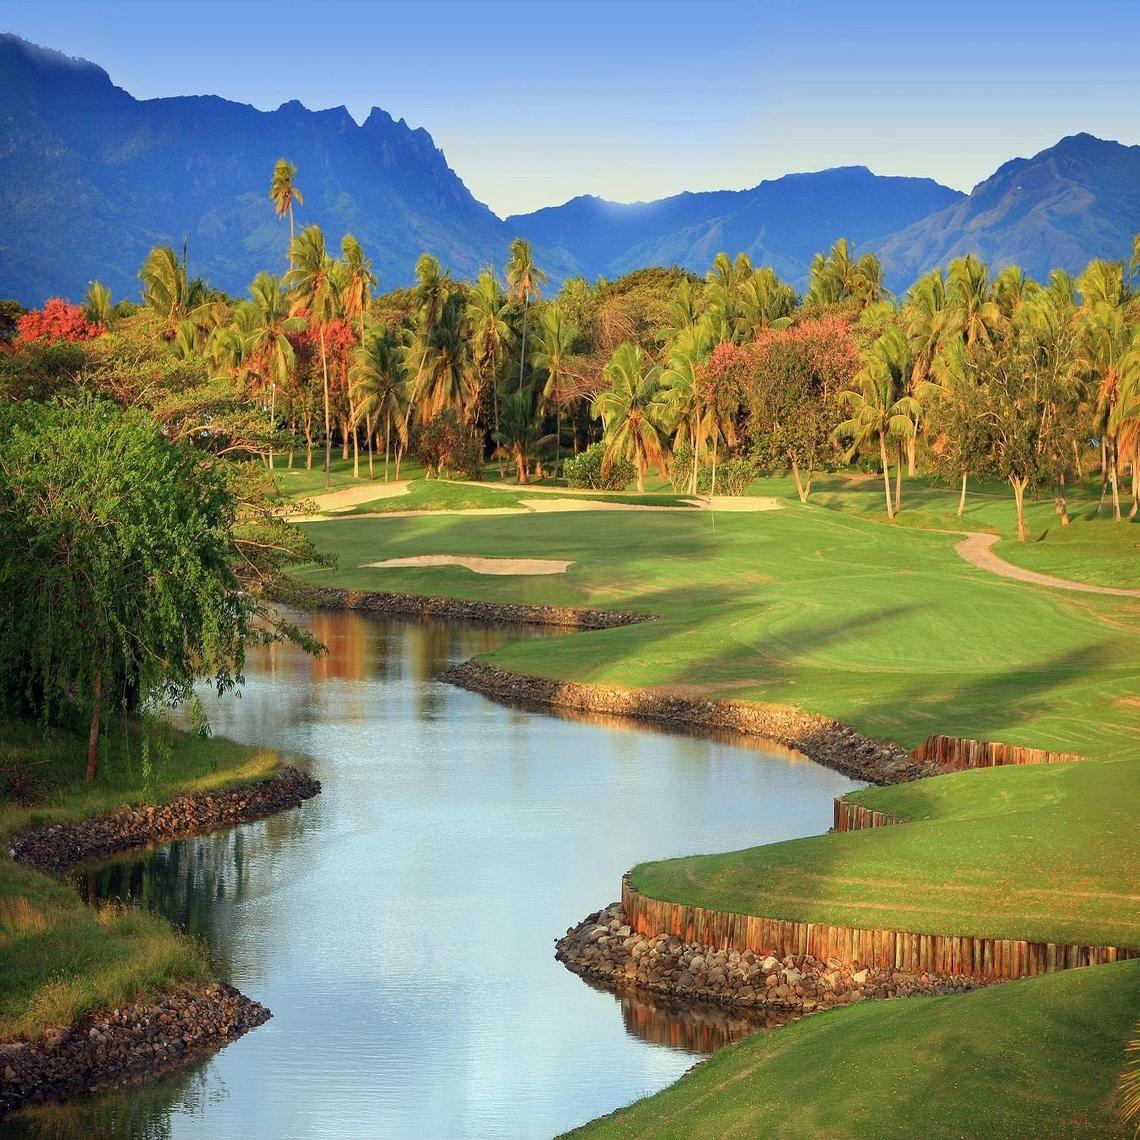 Golf Course Fiji Golf courses, Island resort, Fiji resort